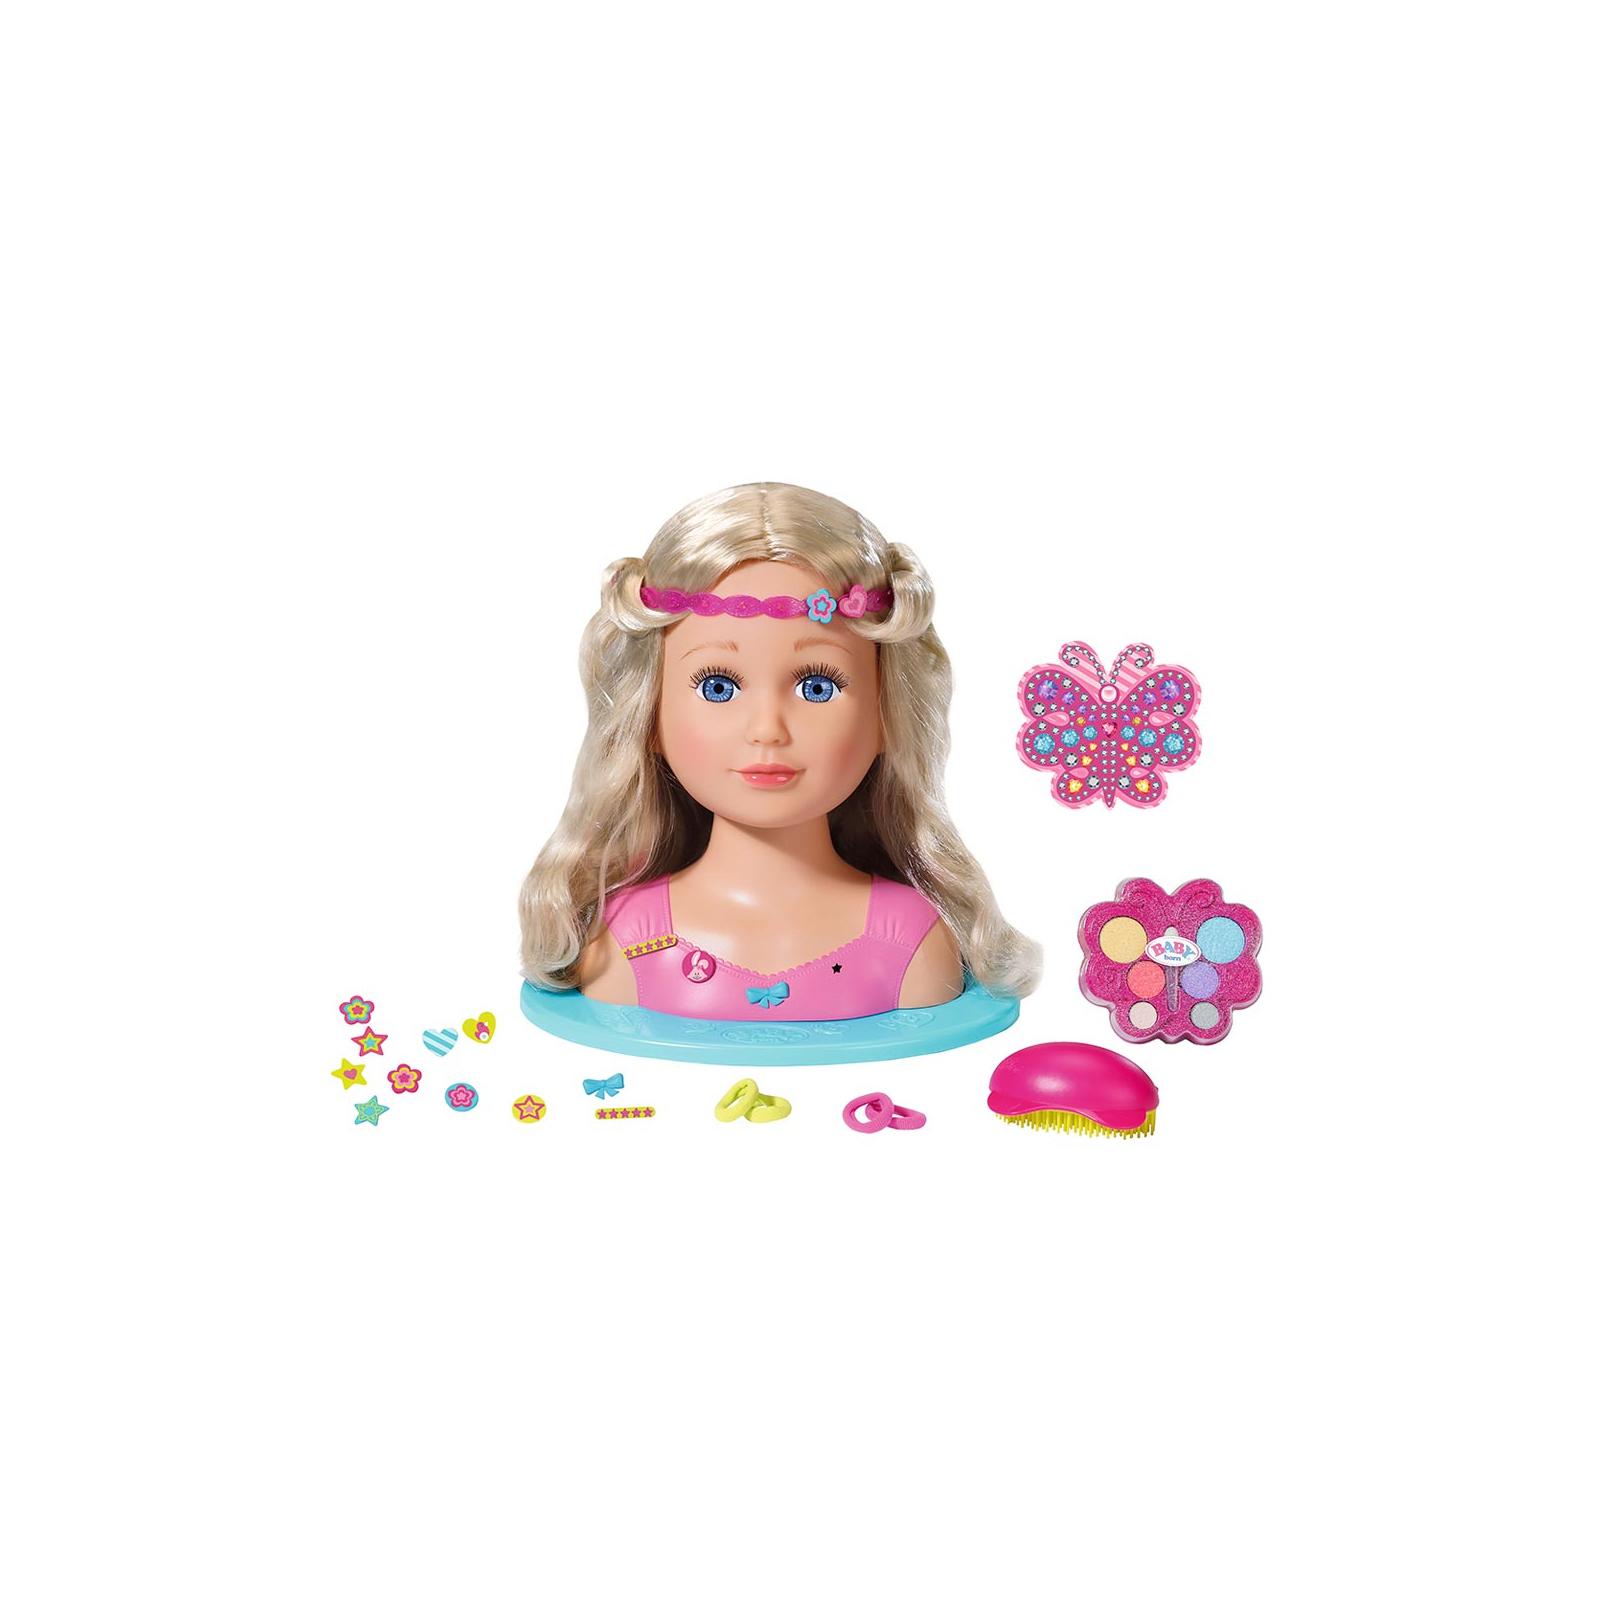 Кукла Zapf манекен My Model Сестричка с аксессуарами (824788)